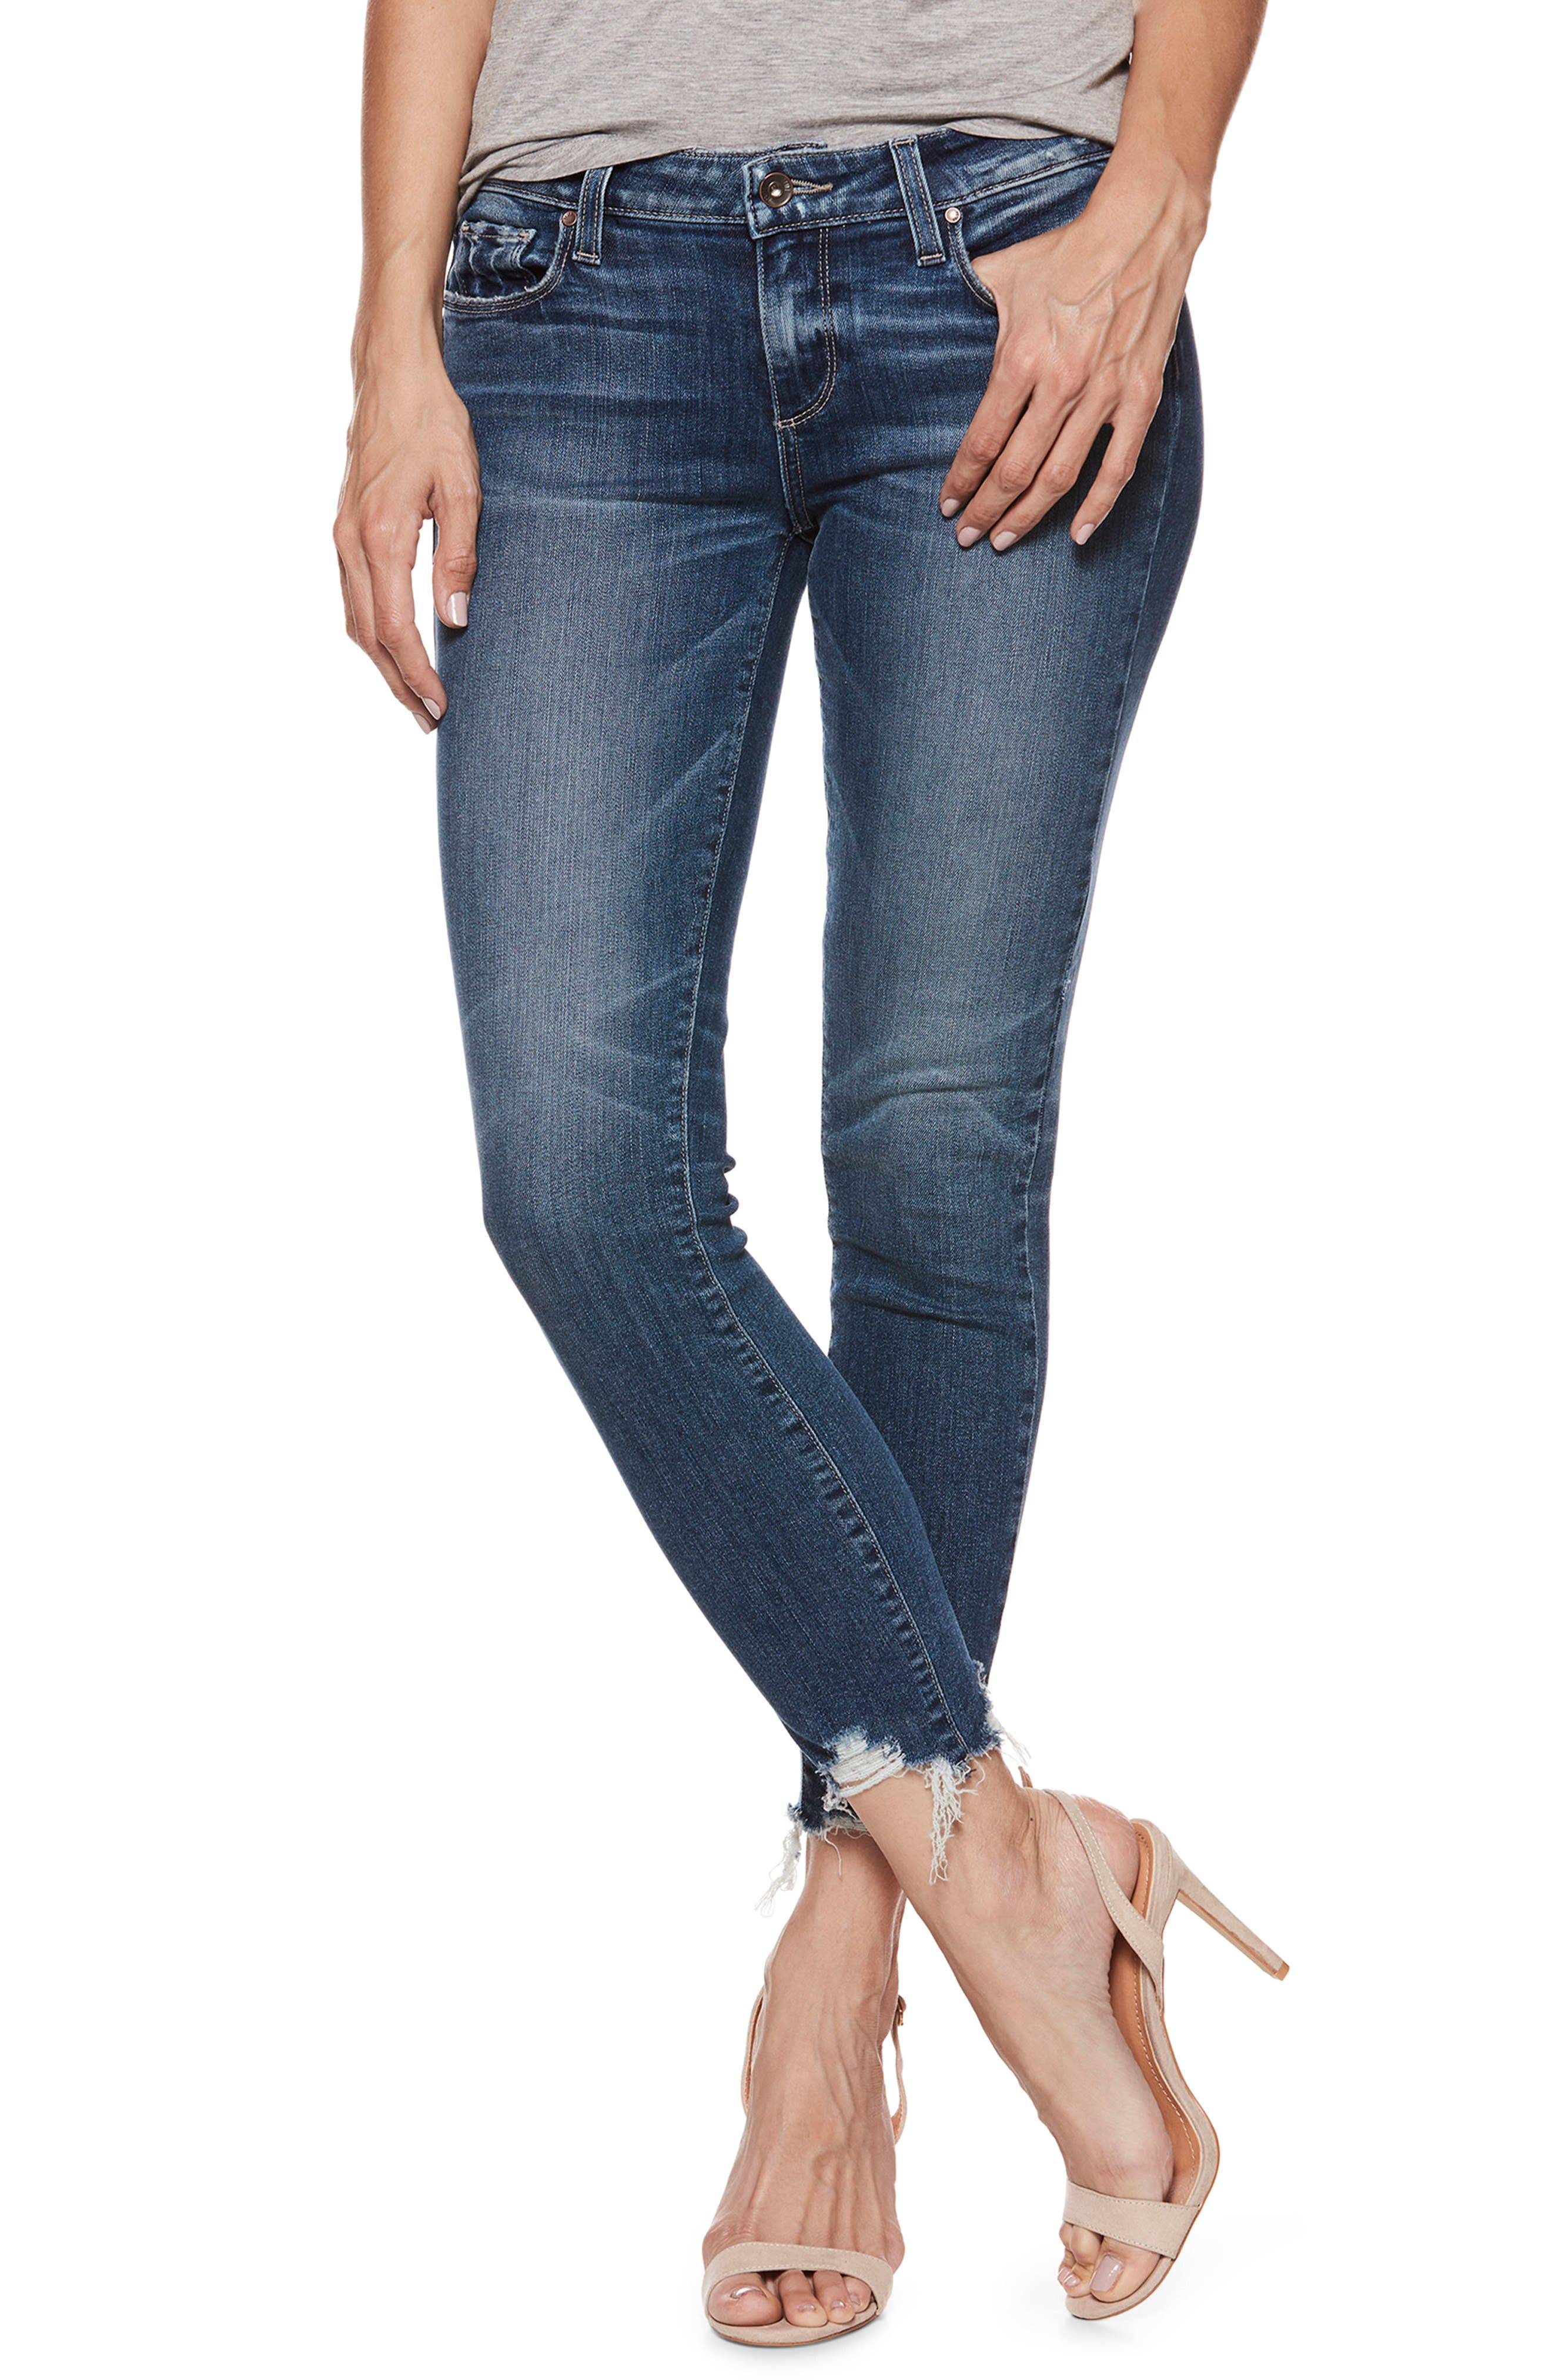 Main Image - PAIGE Transcend Vintage - Verdugo Ankle Skinny Jeans (Malibu Super Distressed)